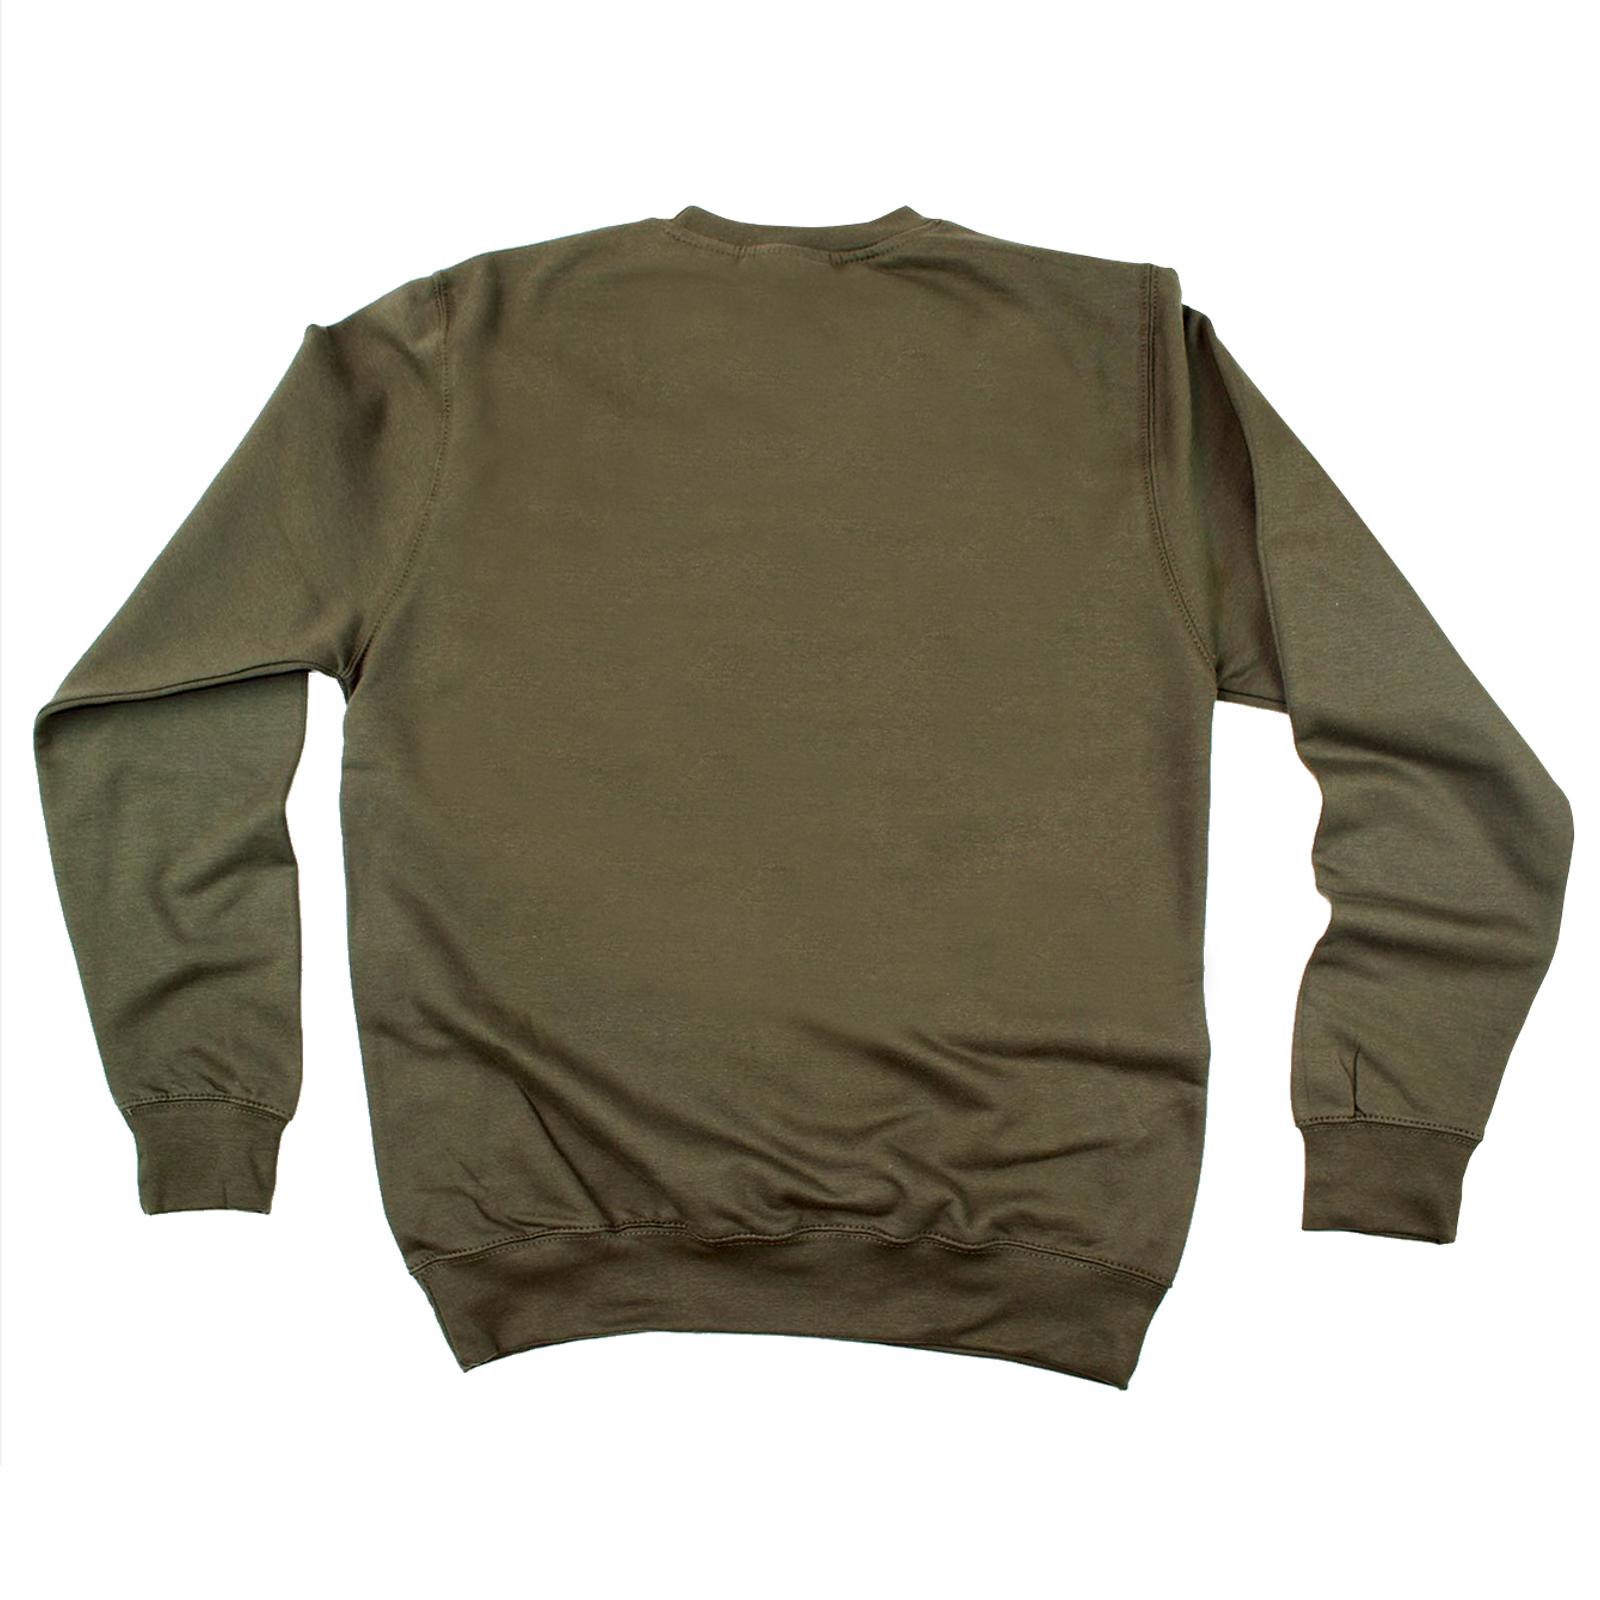 Funny-Sweatshirt-Fck-Off-Fold-In-Birthday-Joke-tee-Gift-Novelty-JUMPER